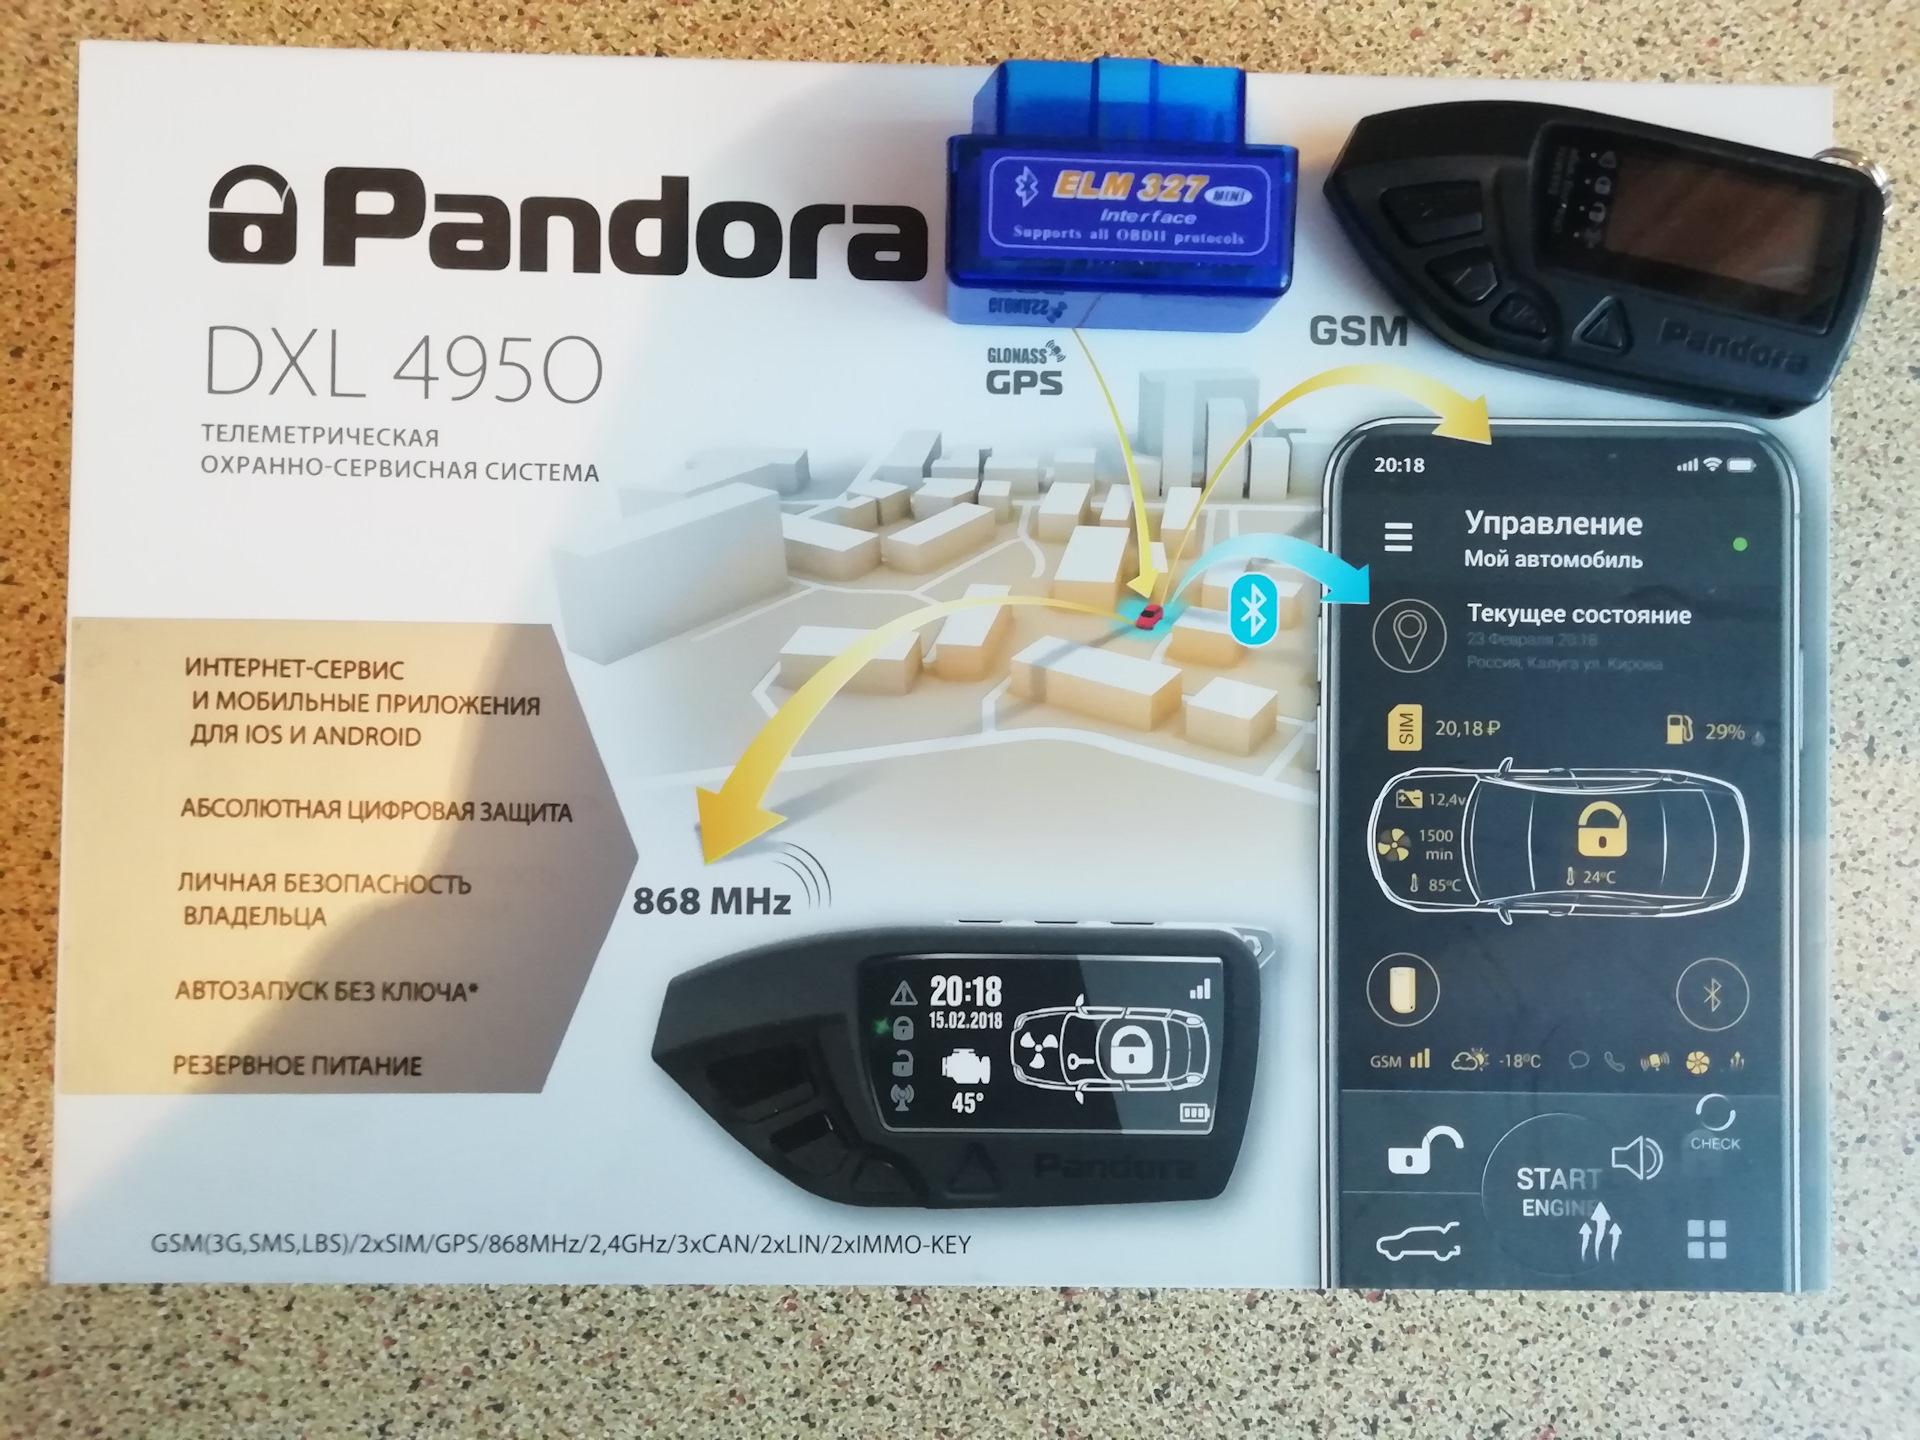 Иммобилайзер Pandora DXL 4950